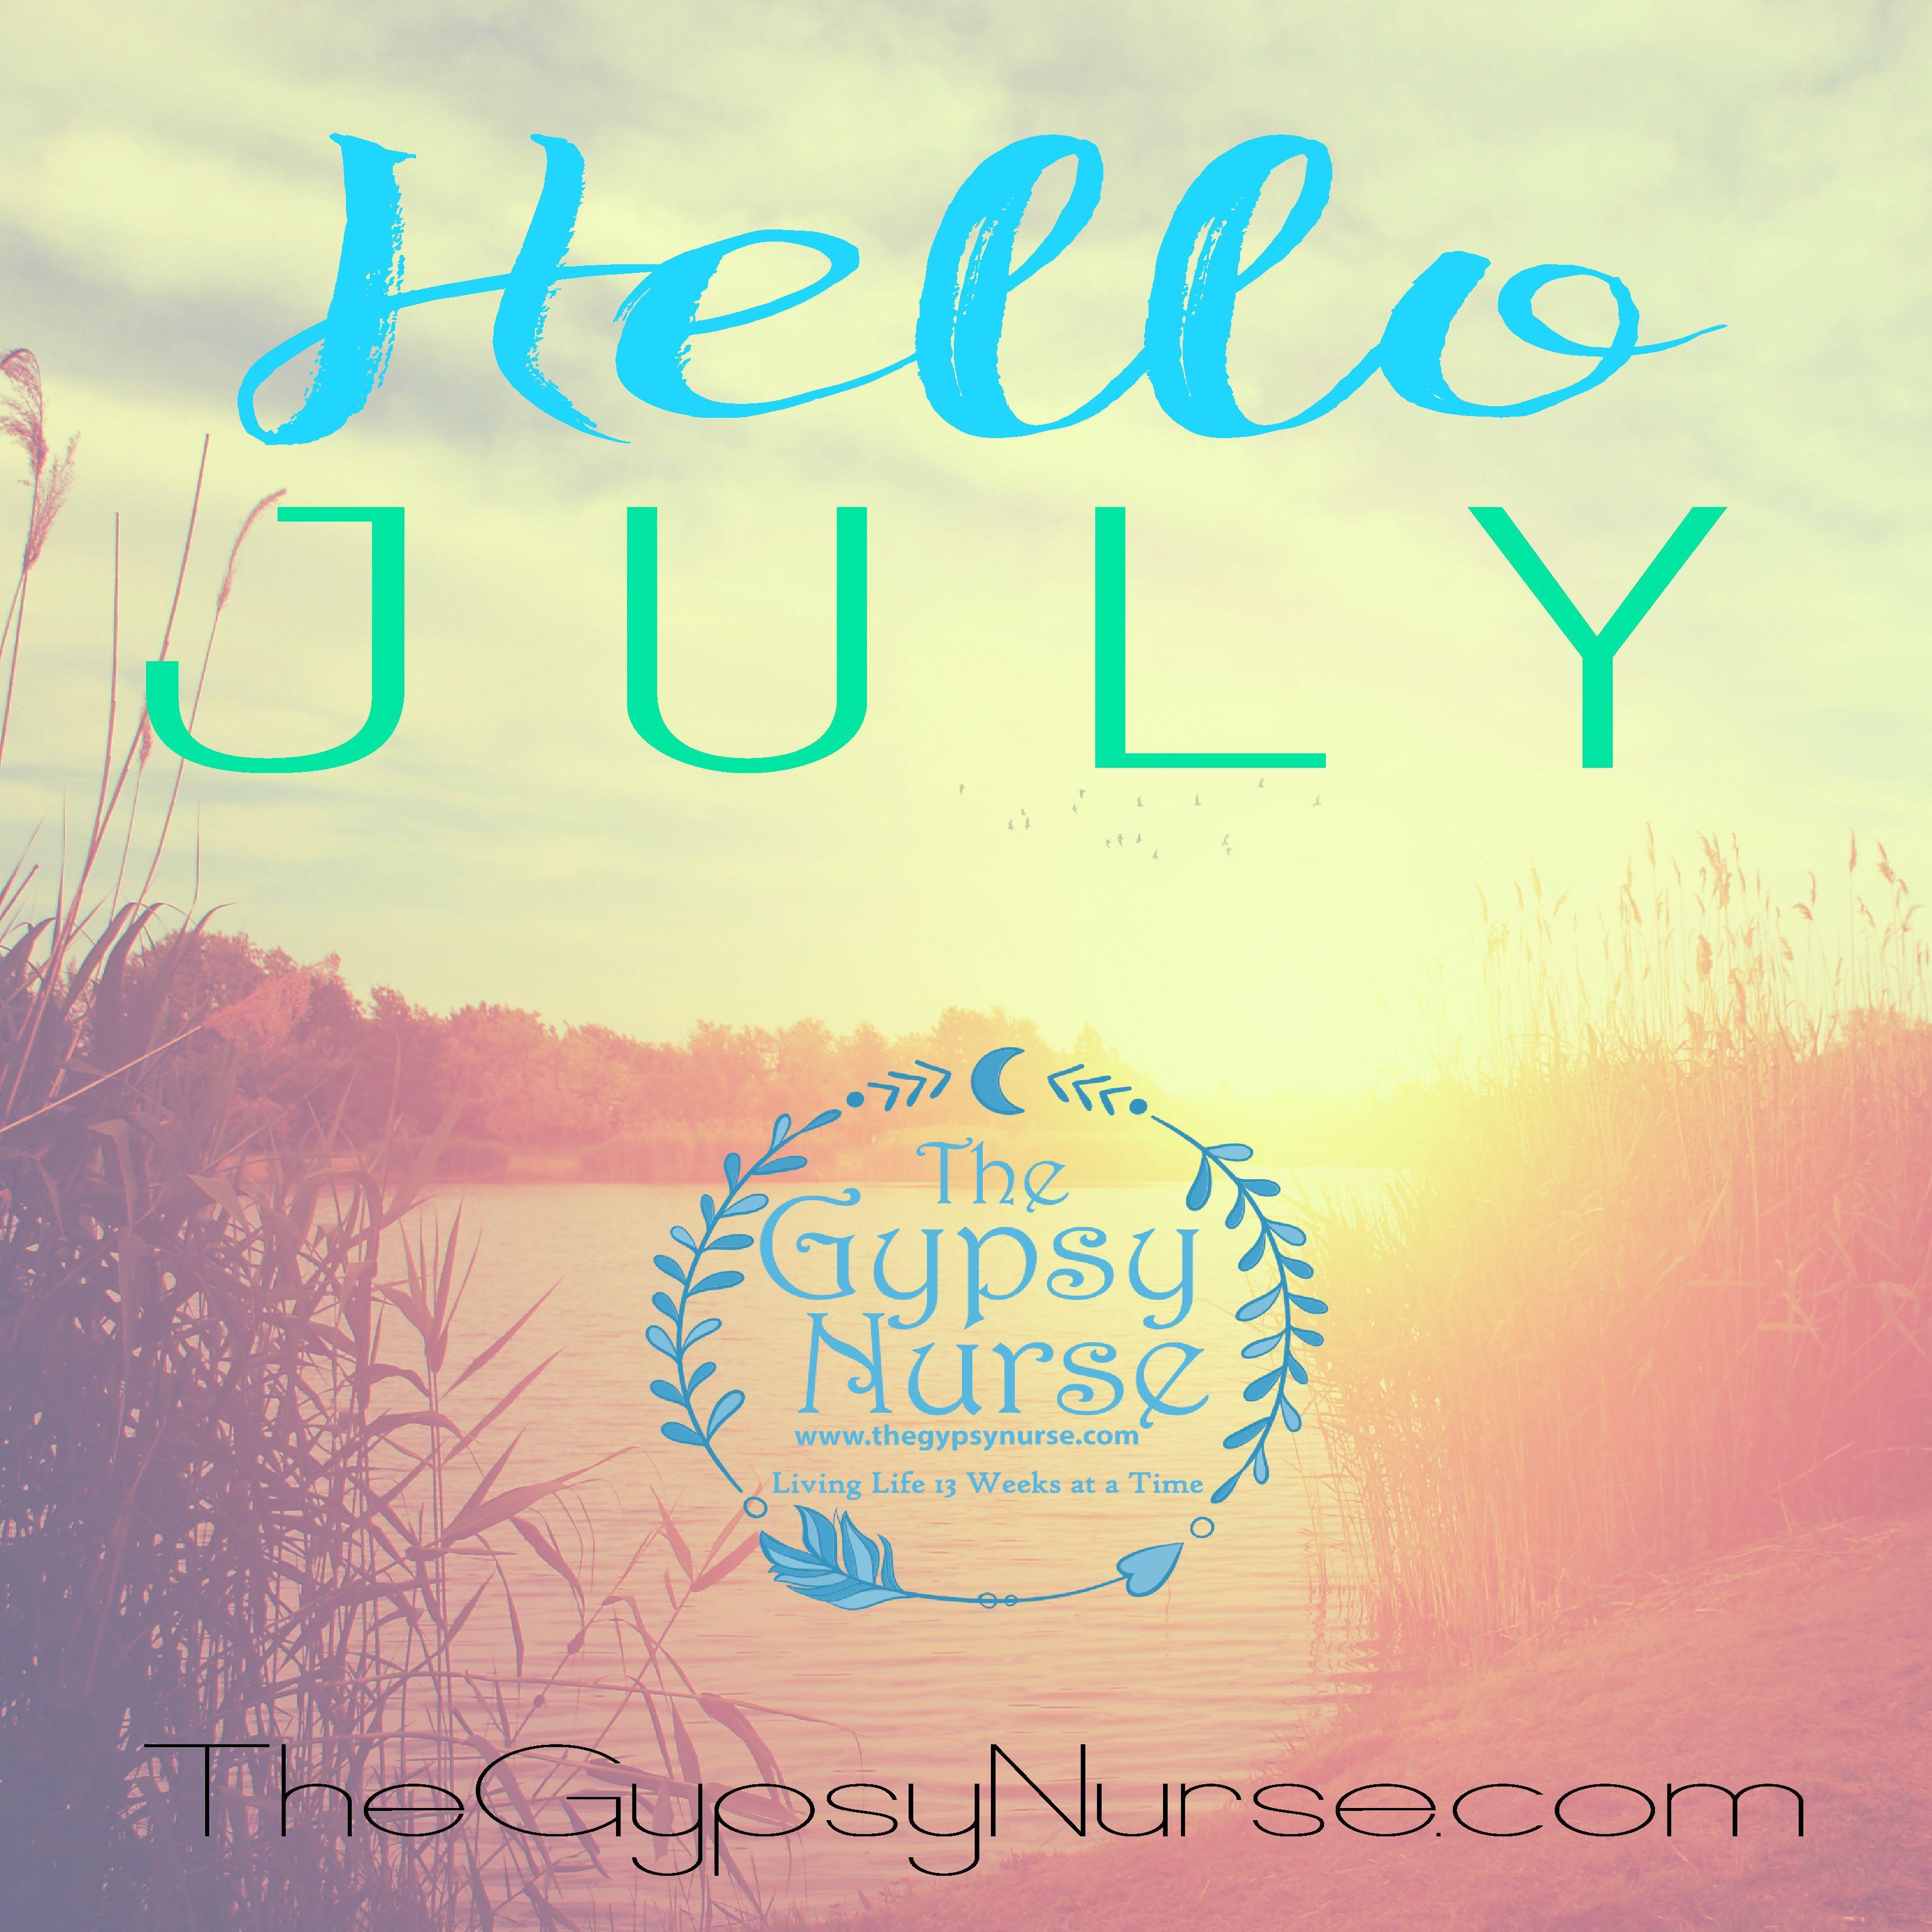 Hello July From Thegypsynurse Com Travelnurse Gypsynurse Hellojuly July Travel Nurse Jobs Travel Nursing Nursing Jobs